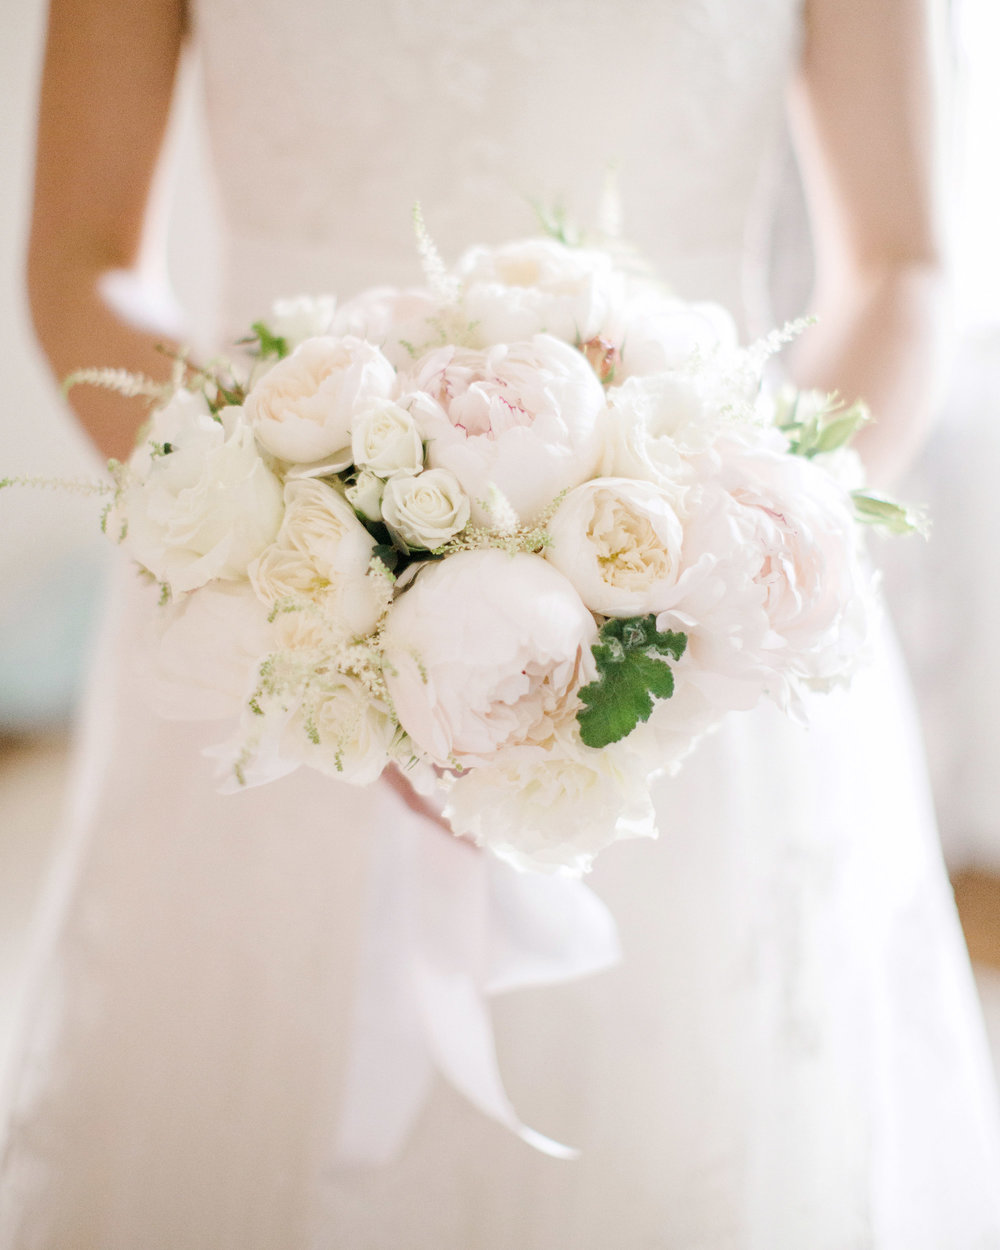 biltmore_santa_barbara_wedding_photos_coral_casino_009.jpg